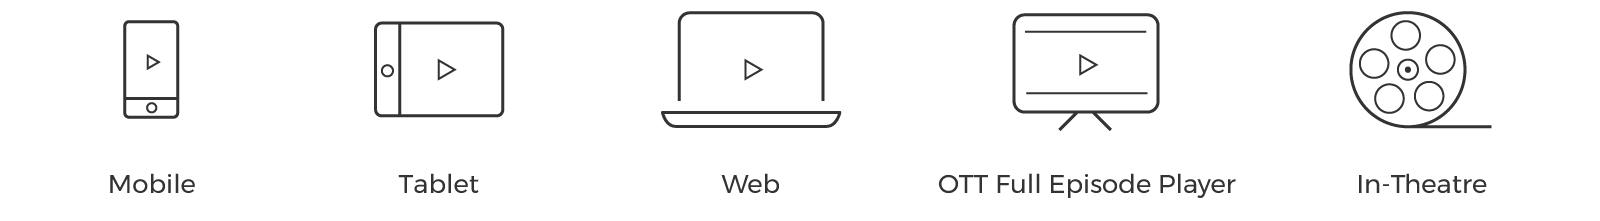 content platforms